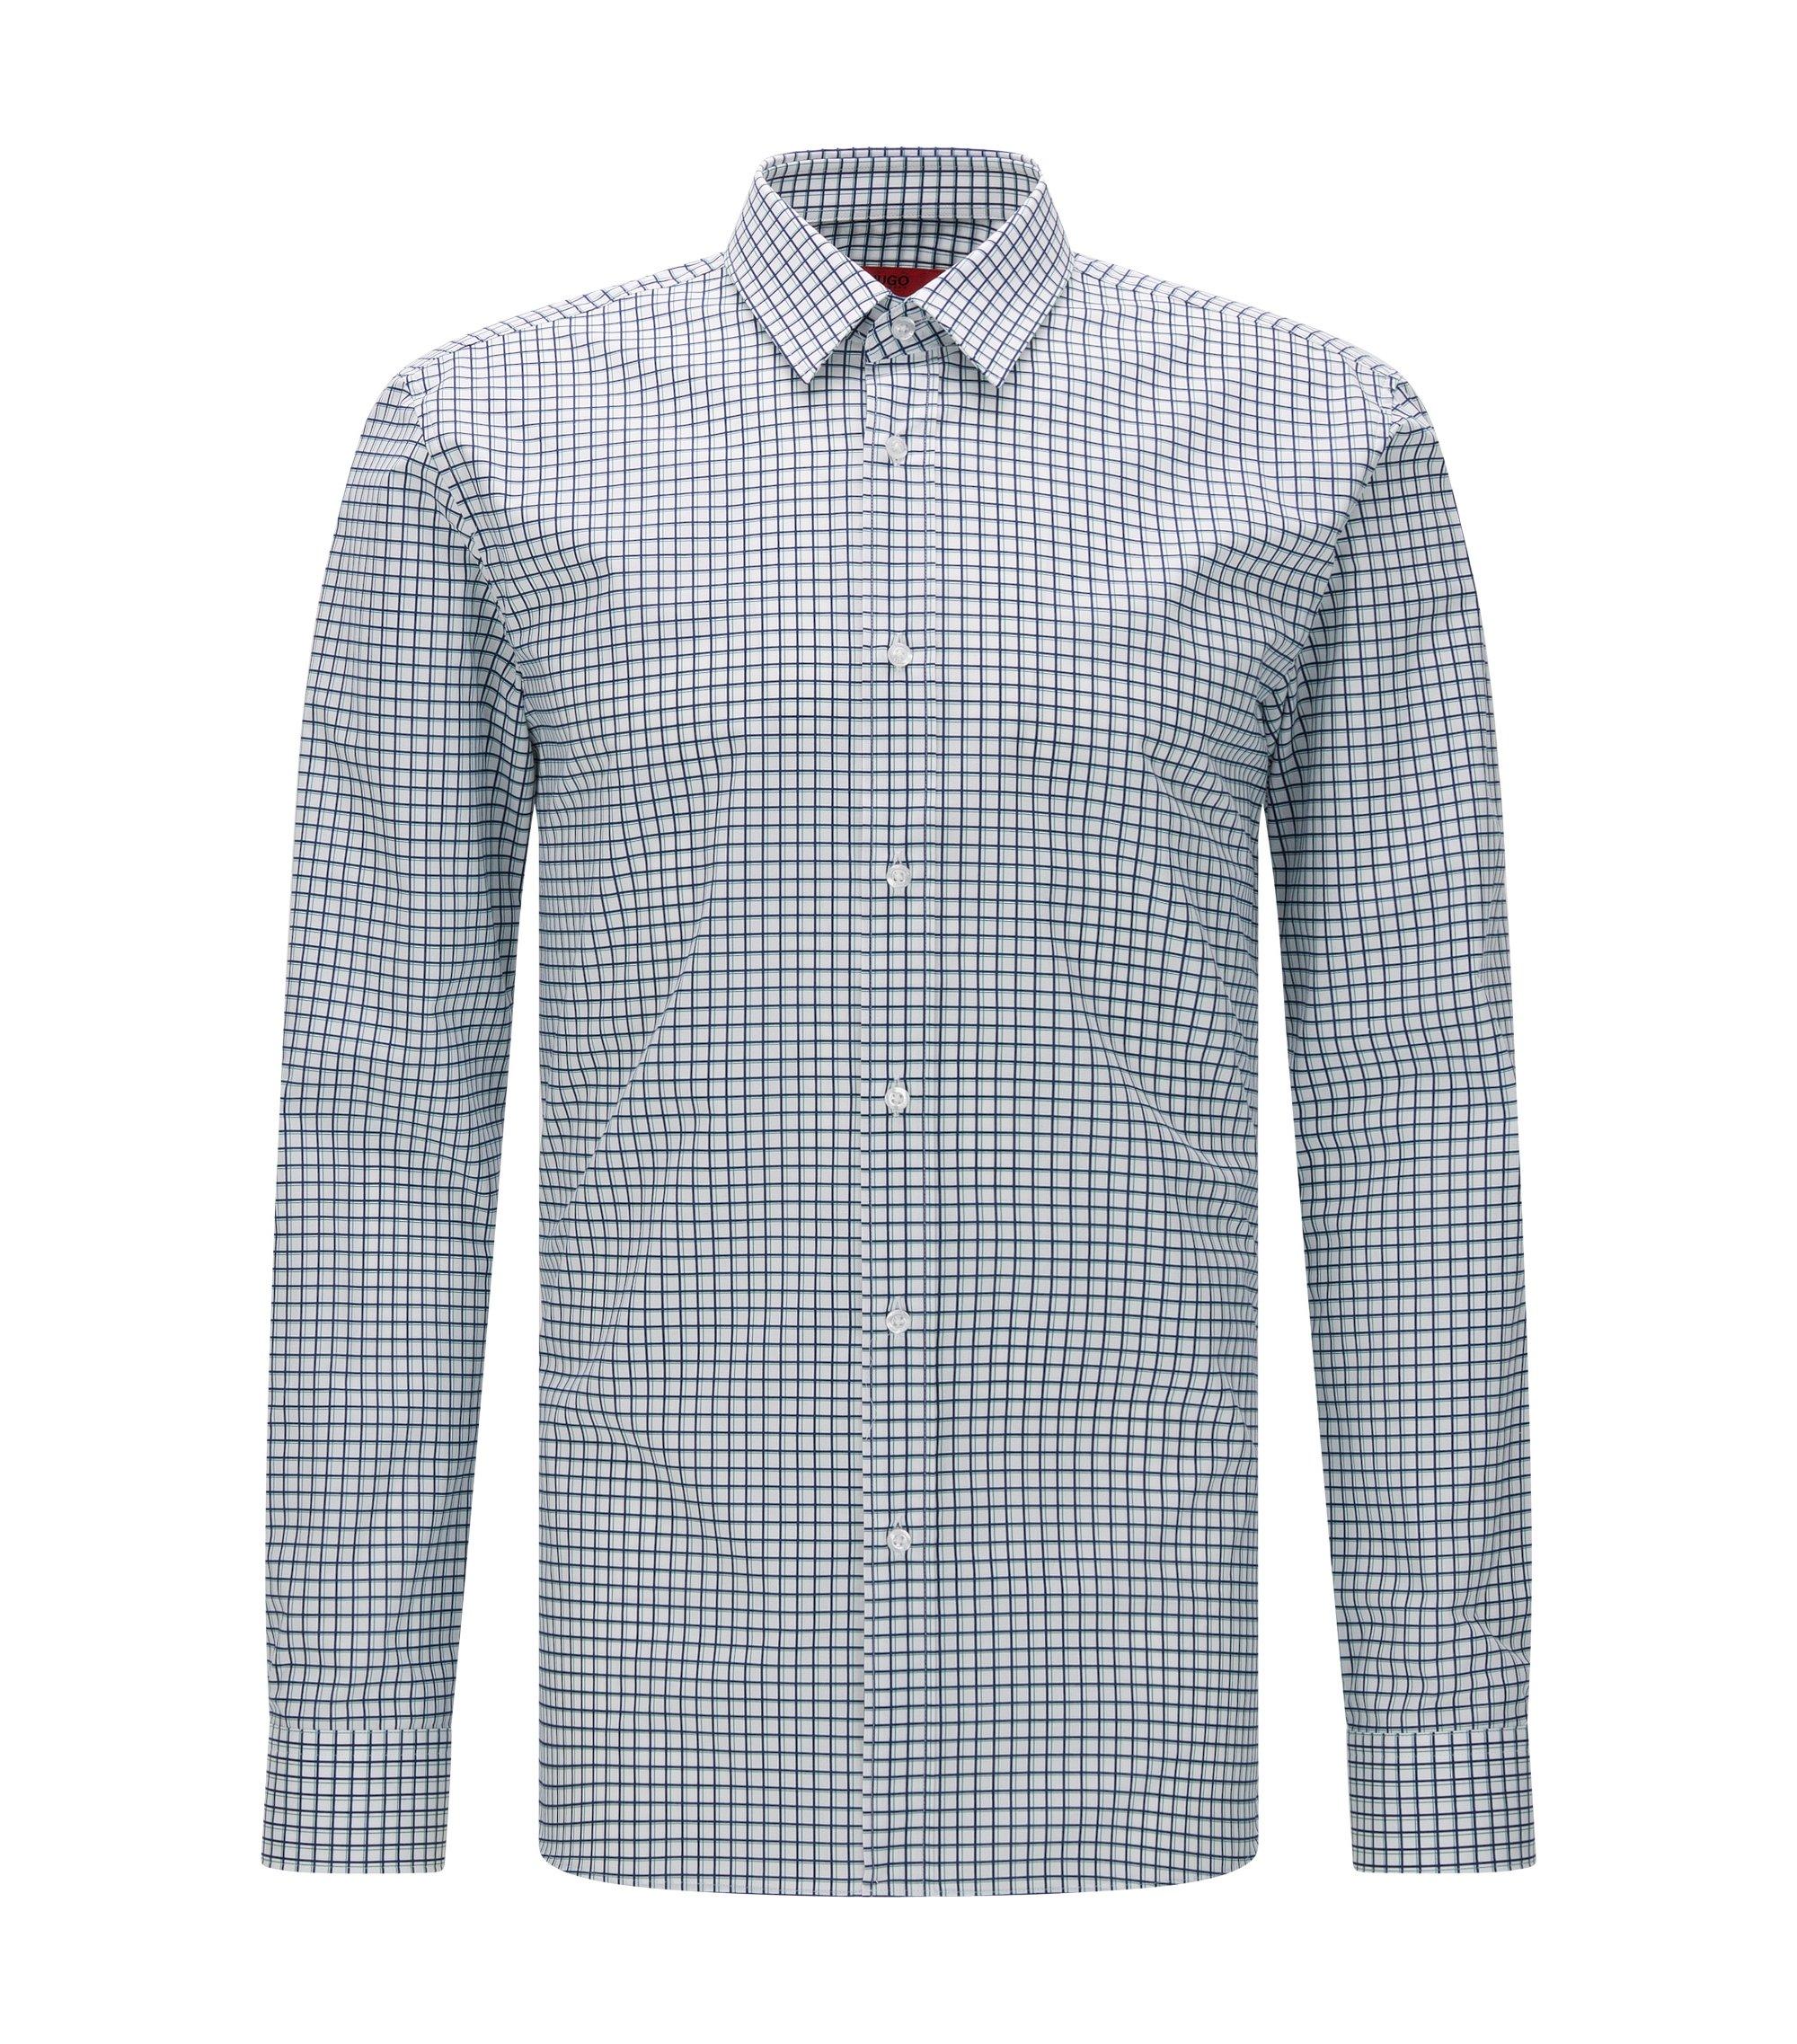 'Elisha' | Exra Slim Fit, Cotton Button Down Shirt, Green